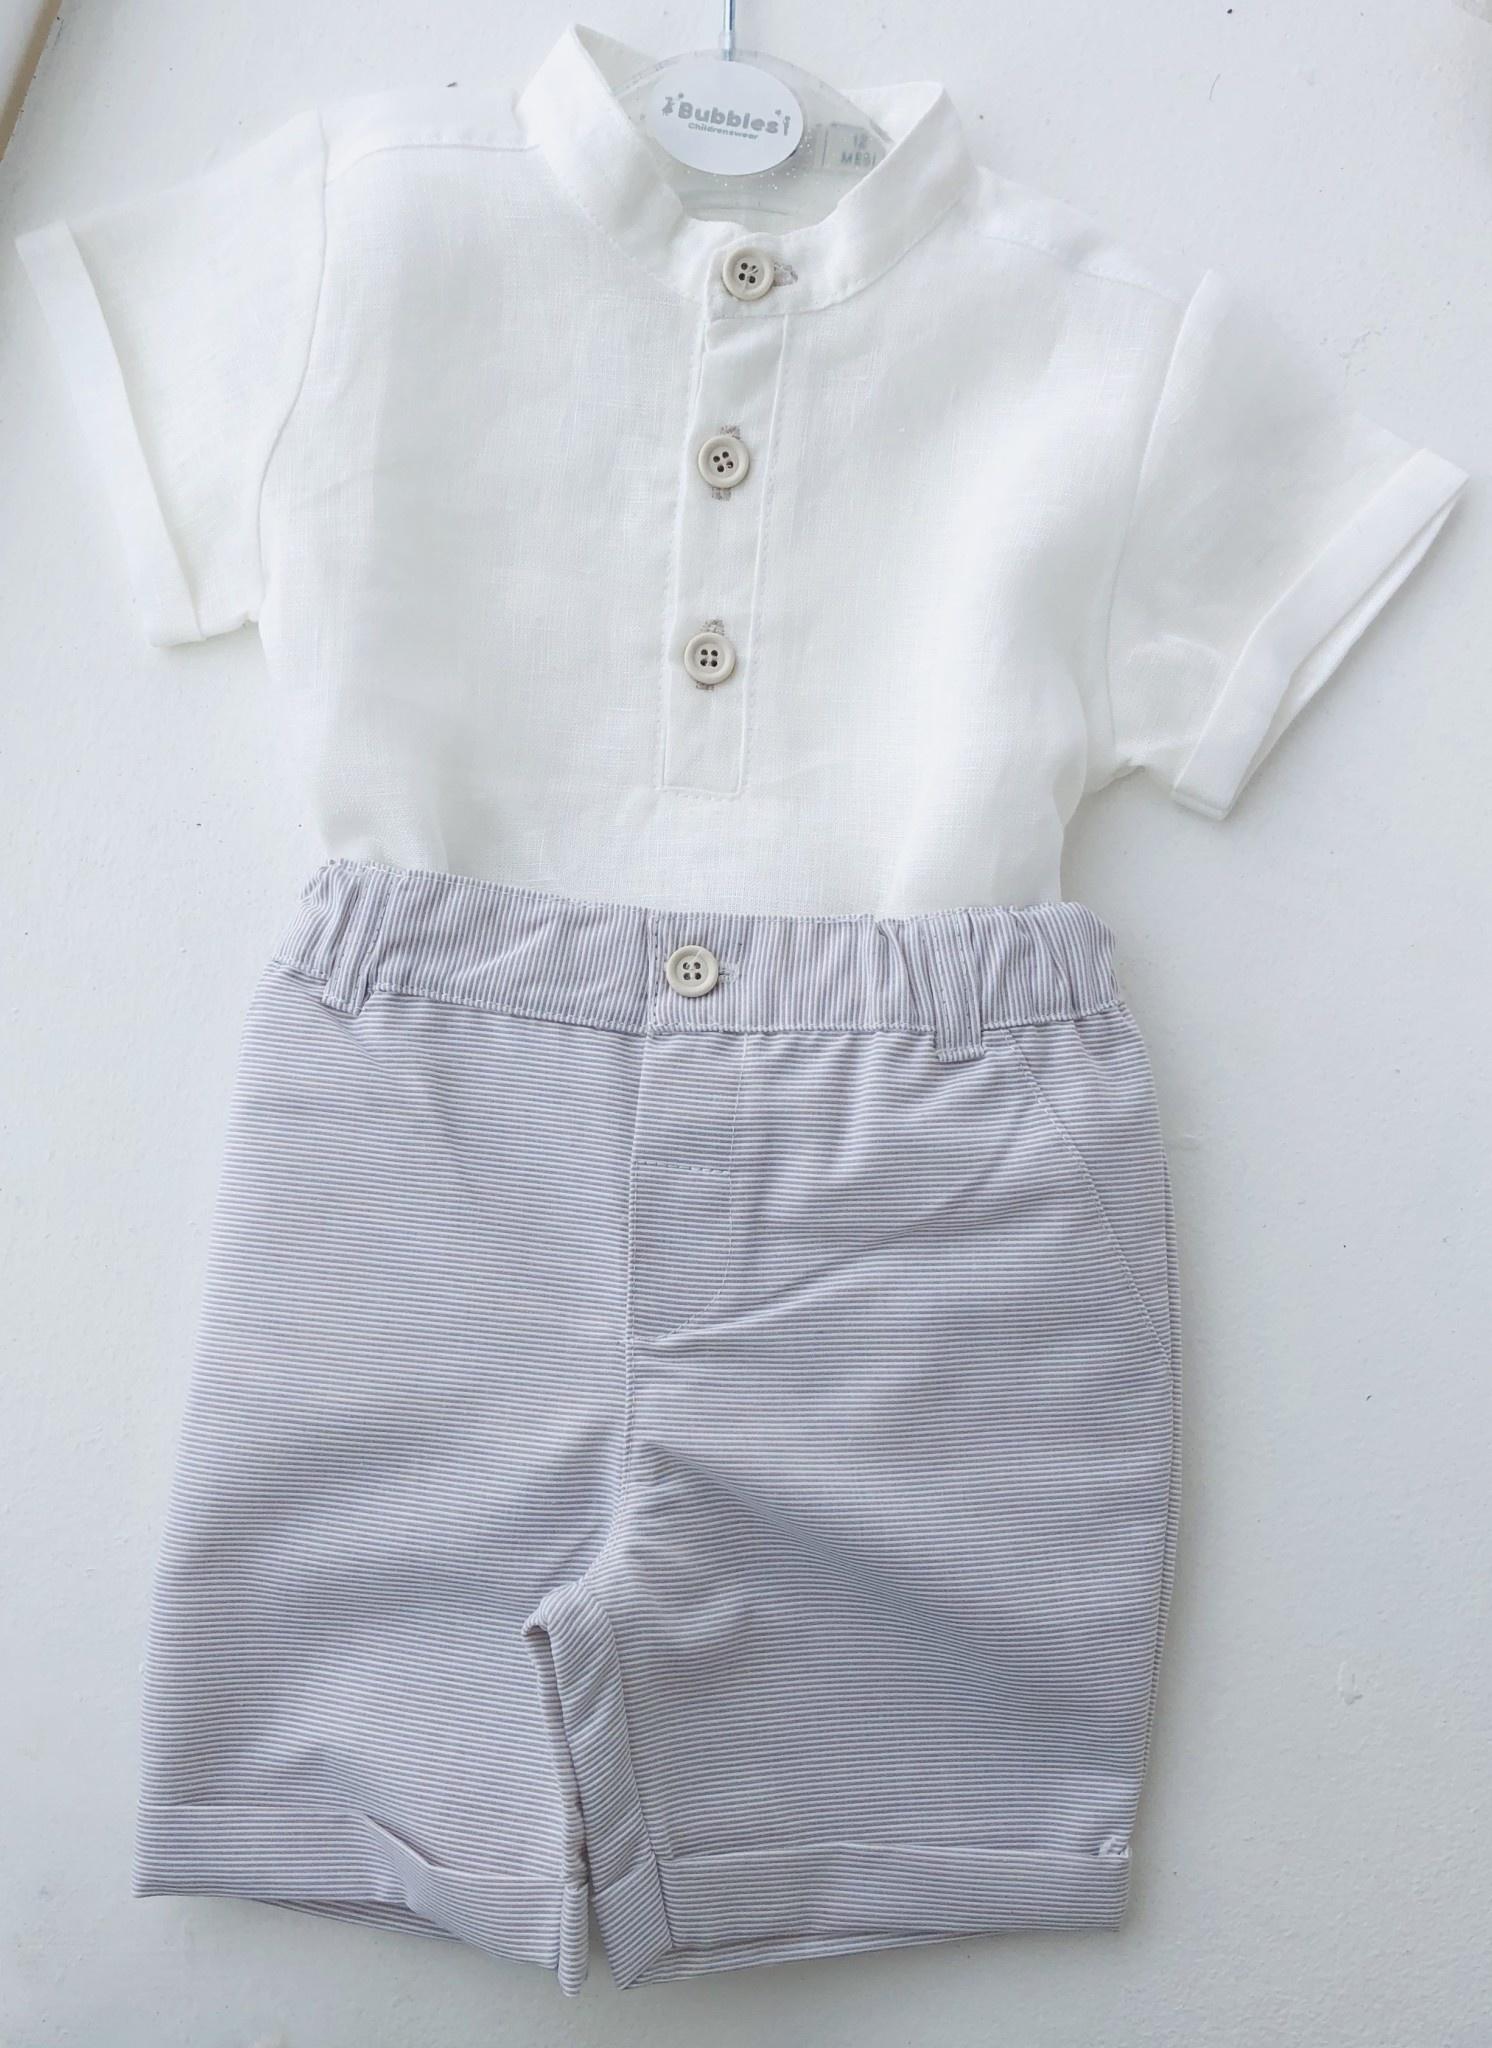 EMC EMC Linen Top and Taupe pin Stripe Shorts Set